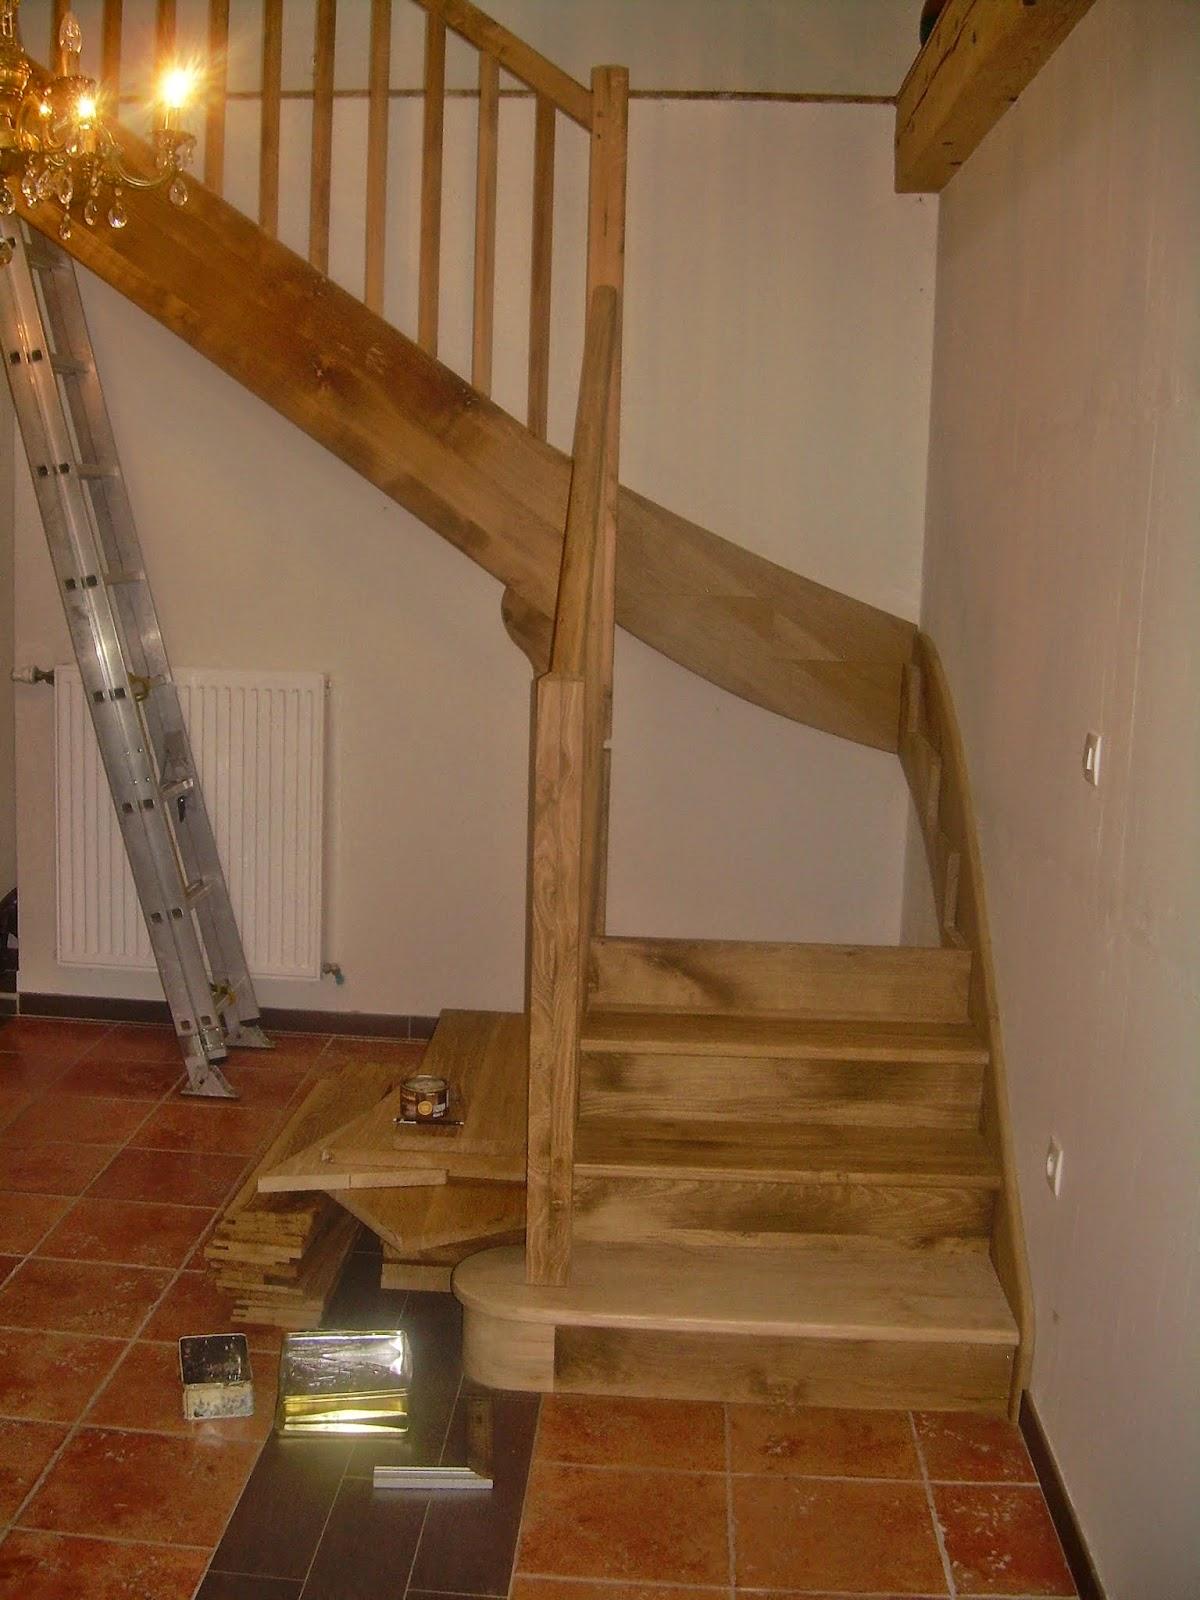 menuiserie d 39 avezac construire un escalier. Black Bedroom Furniture Sets. Home Design Ideas